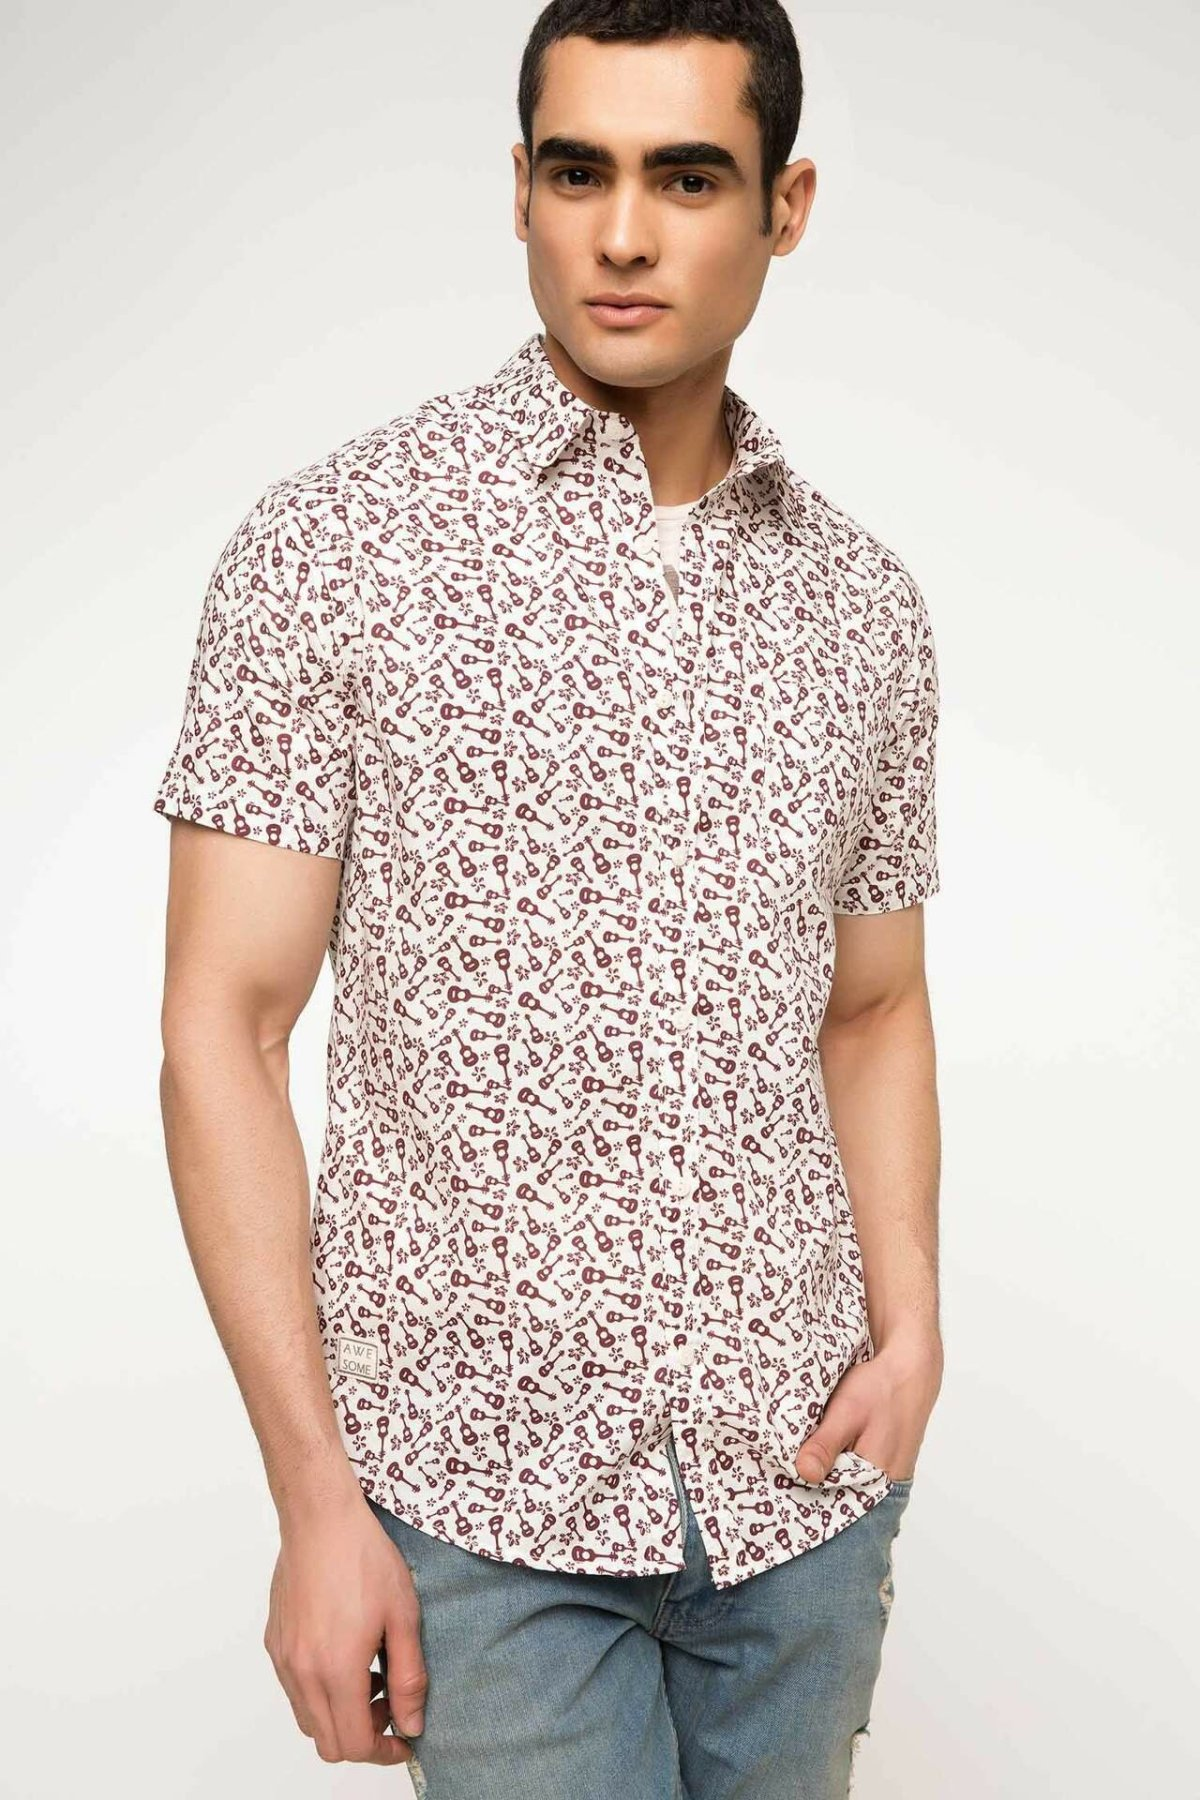 DeFacto Summer Fashion Man Print Pattern Short Sleeve Shirt Male Casual Blousers Men's Leisure Loose Comfort Shirts - G7765AZ17H